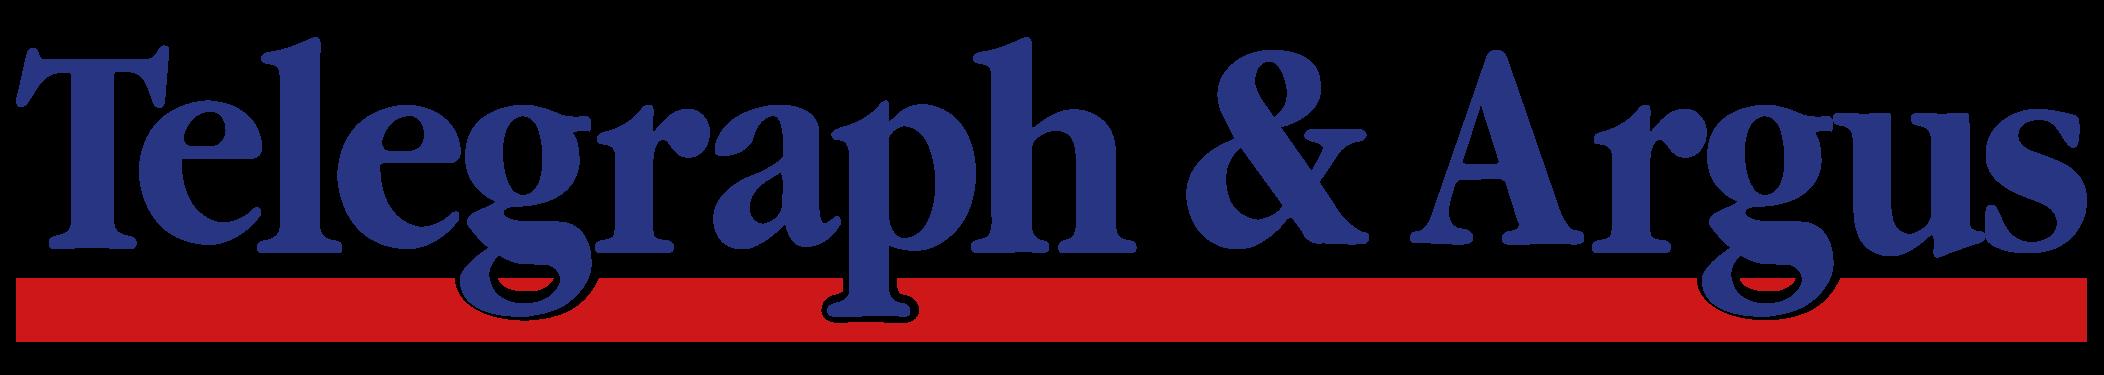 Telegraph and Argus (Bradford) logo